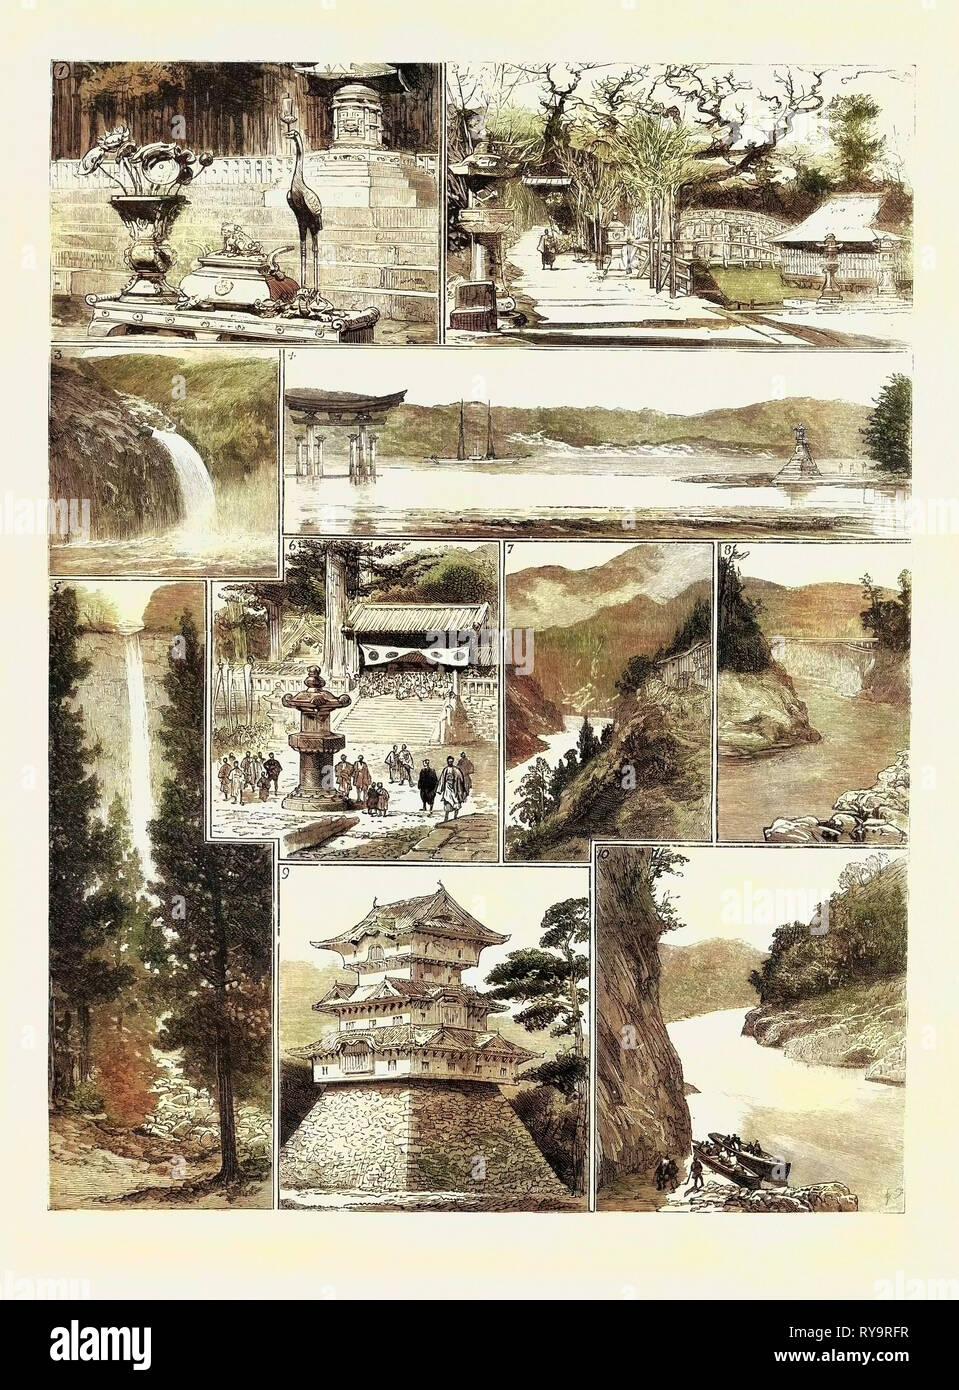 Places in Japan, I. Iyeyasu's Tomb, Nikko. 2. Itsukusima  the Temples  3. Waterfall at Toji-No-Ki, Near Kumamoto 4. Itsukusima  the Torii  5. Waterfall at Nachi, Kishu  6. Festival at Nikko 7. Ten-Riu River at Nishi-No-to  8. Ota Bridge, Ten-Riu-Gowa 9. Nagoya Castle, Ten-Riu-Gowa, from below Ota, Engraving 1884 Stock Photo